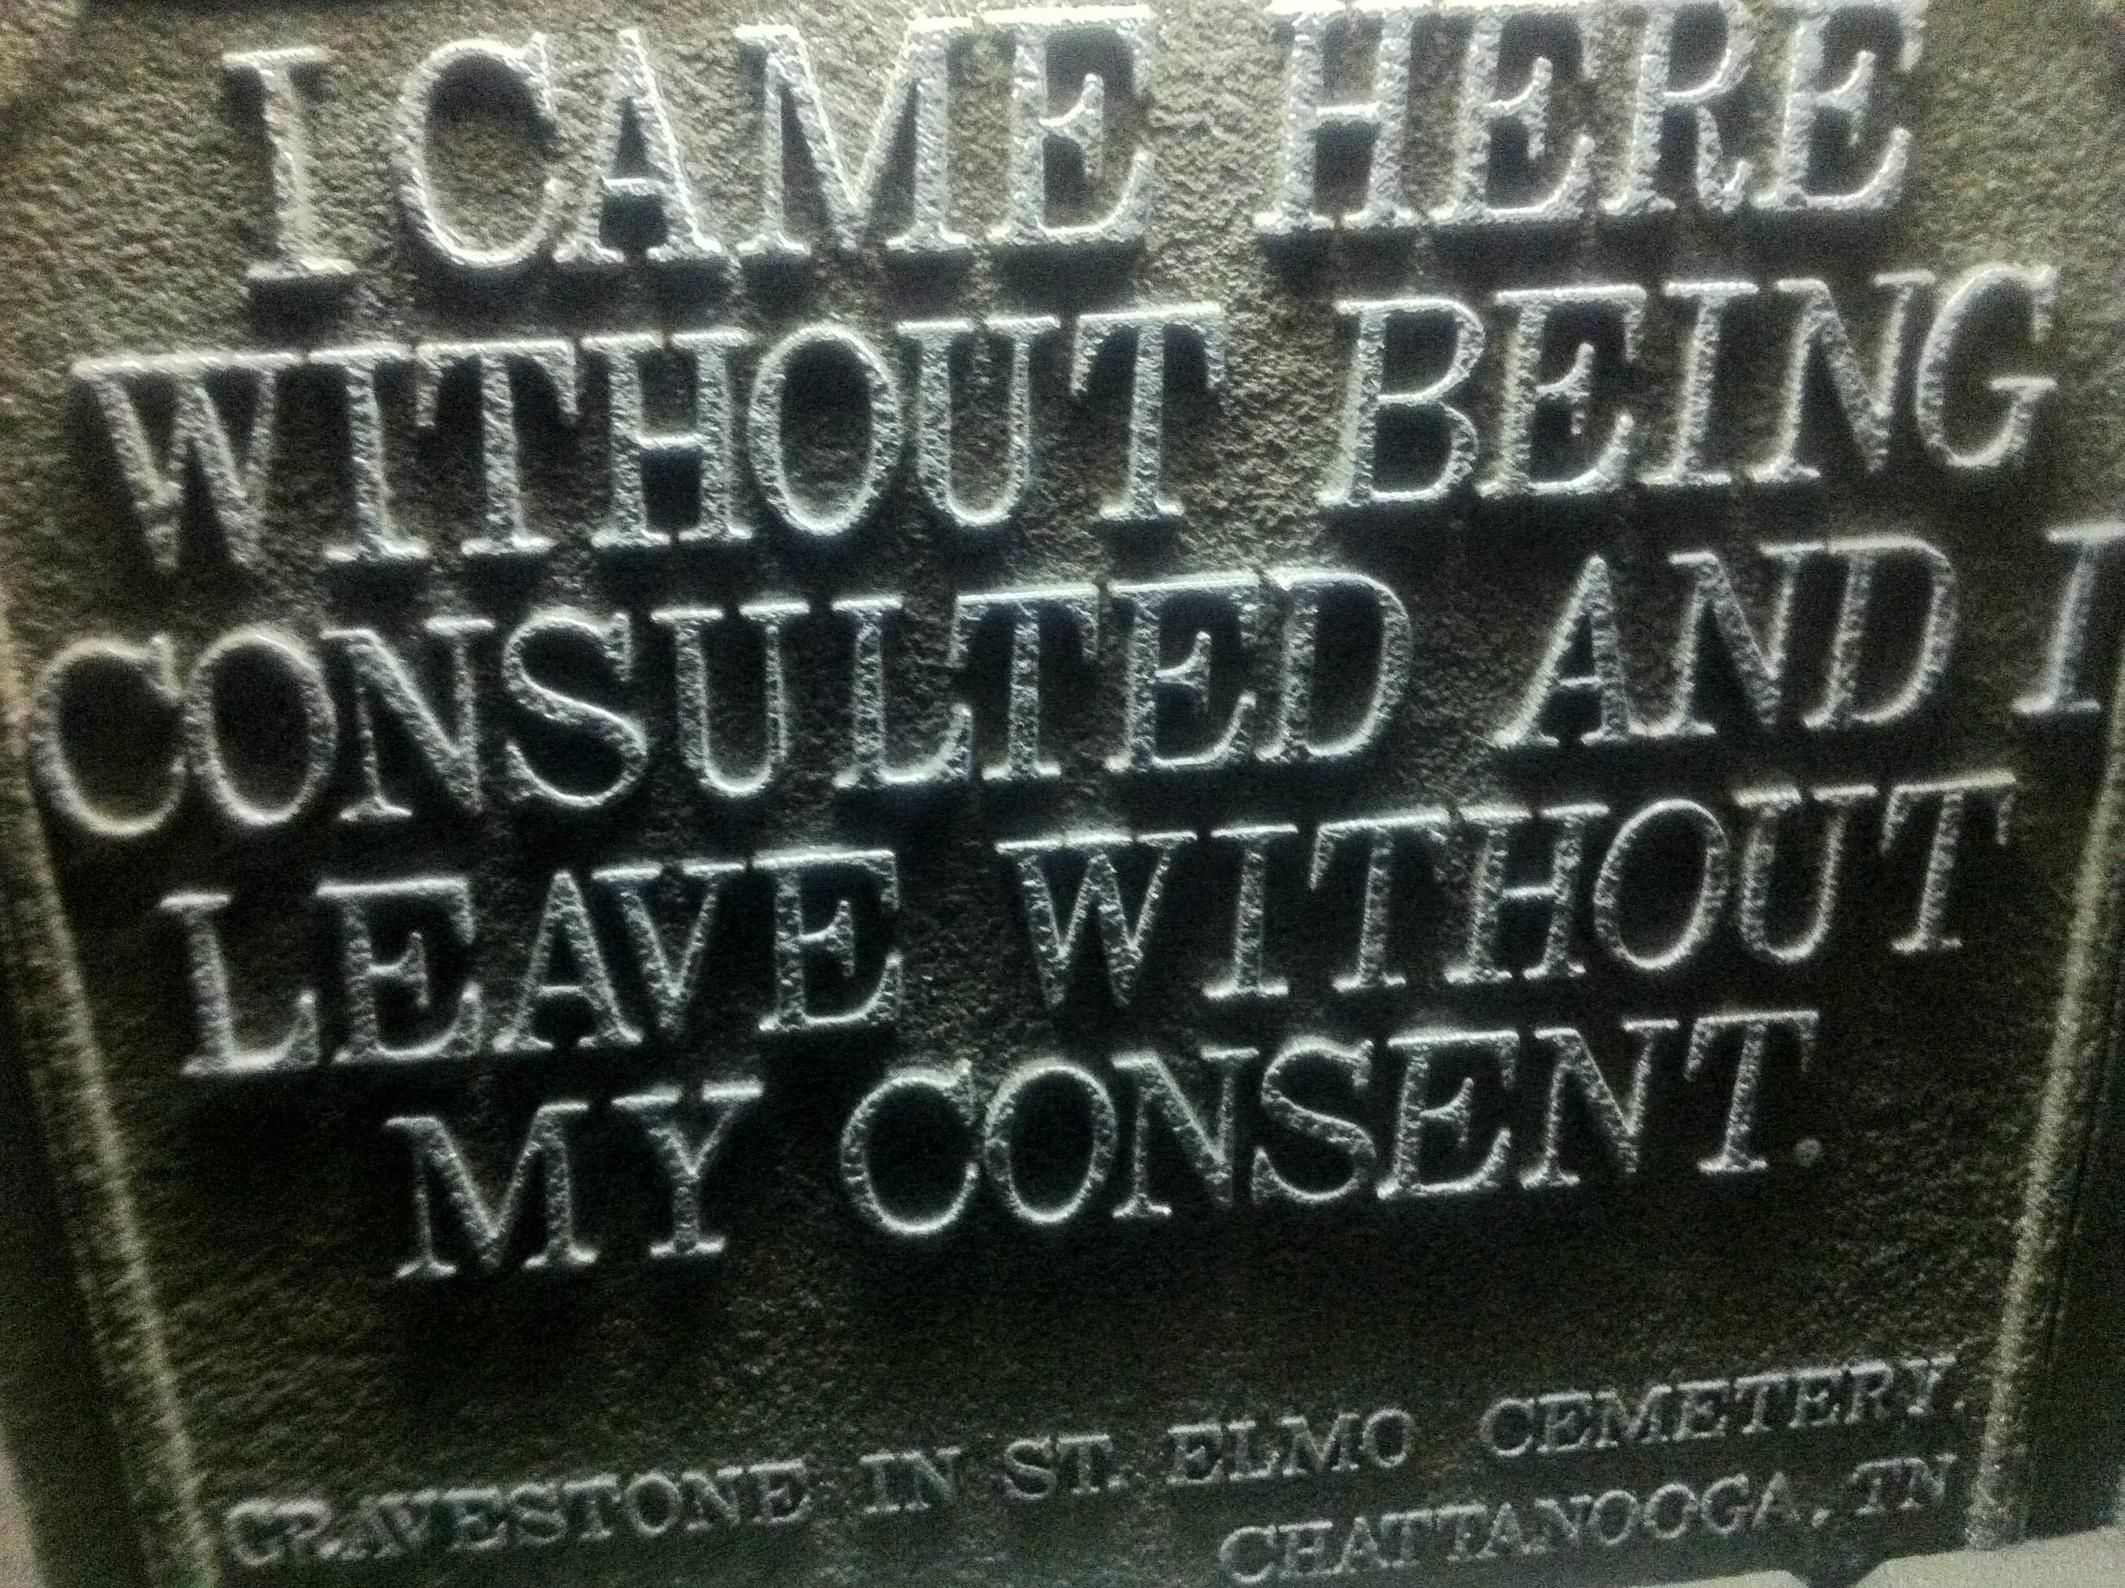 Funny Quotes Tombstone Epitaph Gravestone